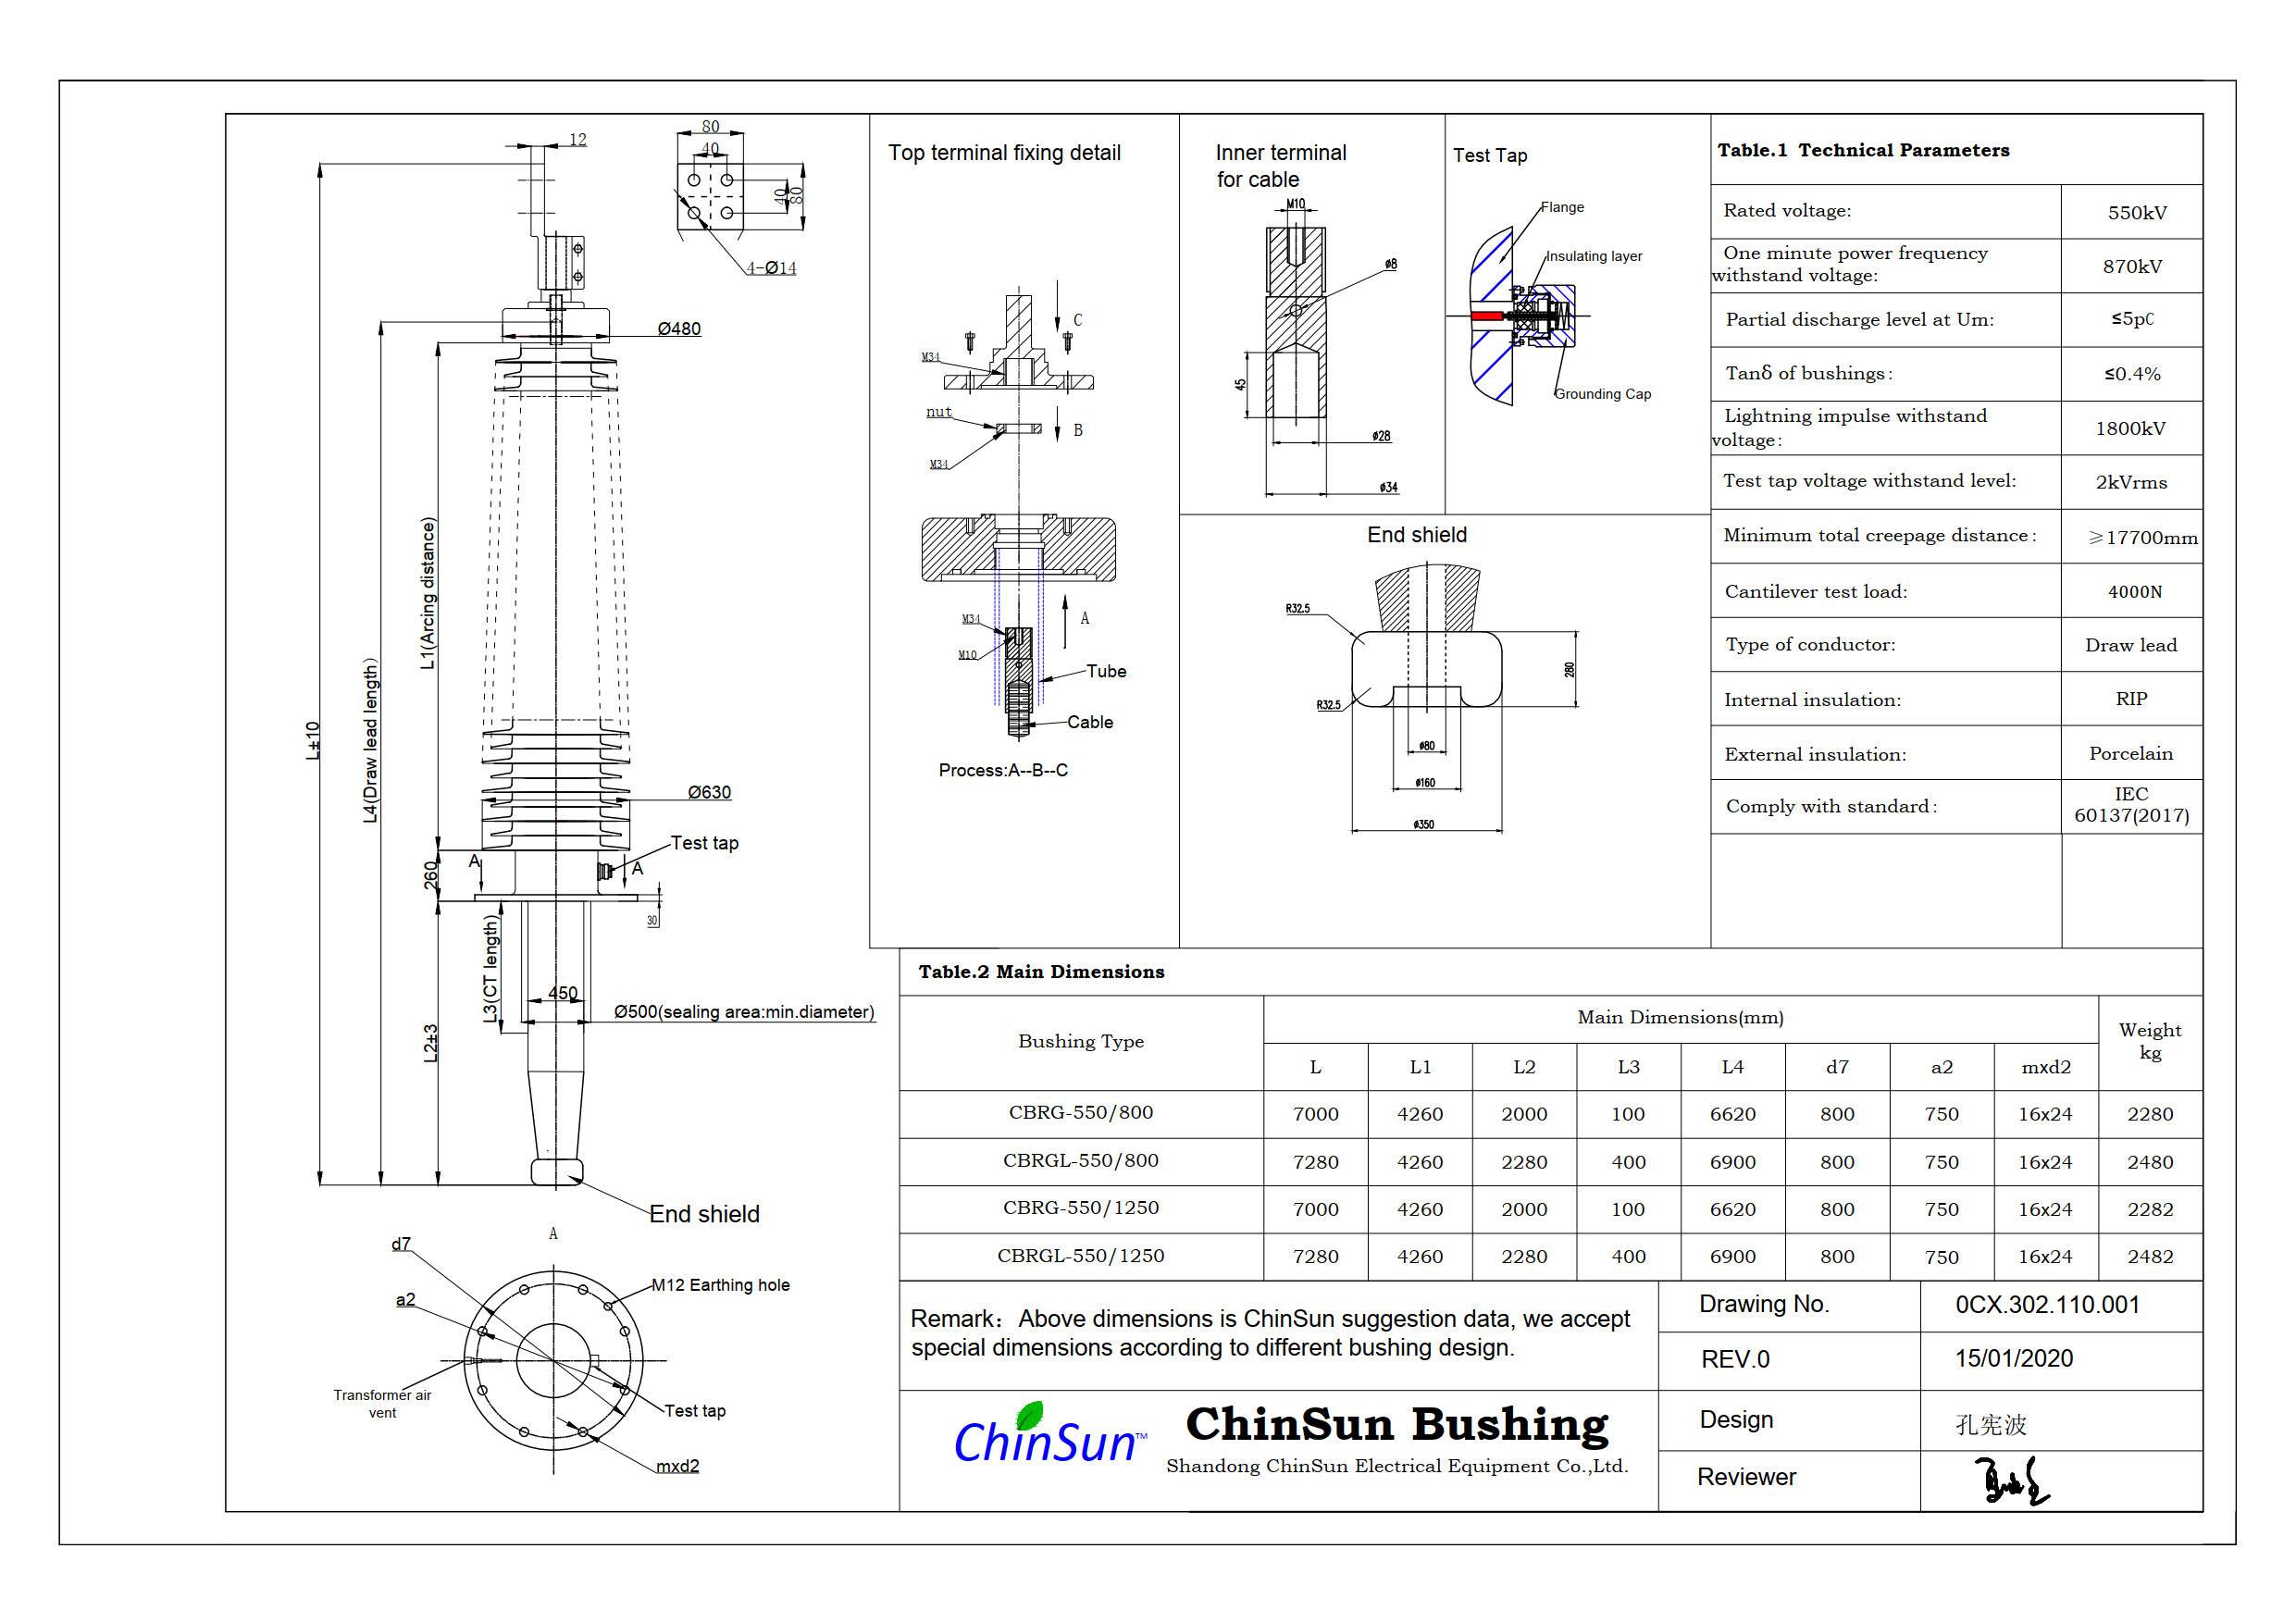 Drawing-transformer bushing-550kV_porcelain-DL-ChinSun